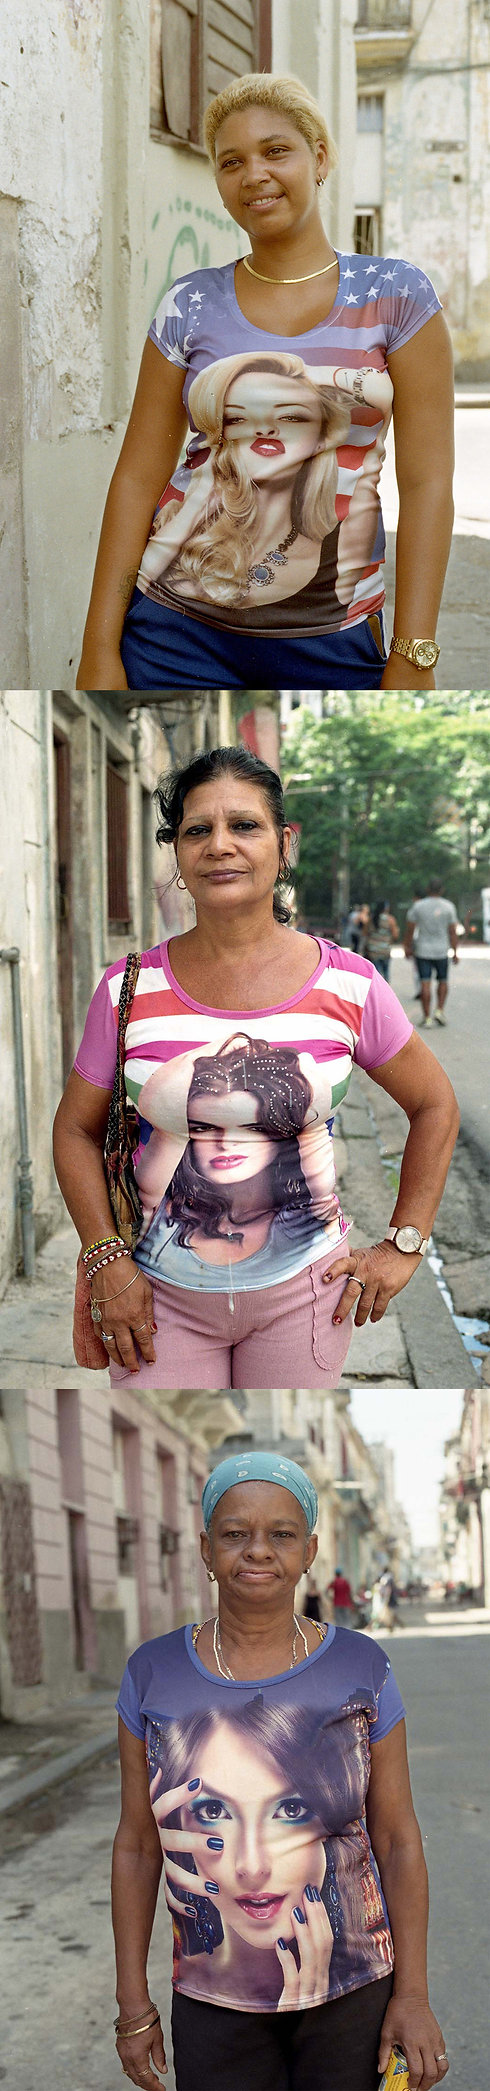 cuban woman dressed_tana garrido.jpg